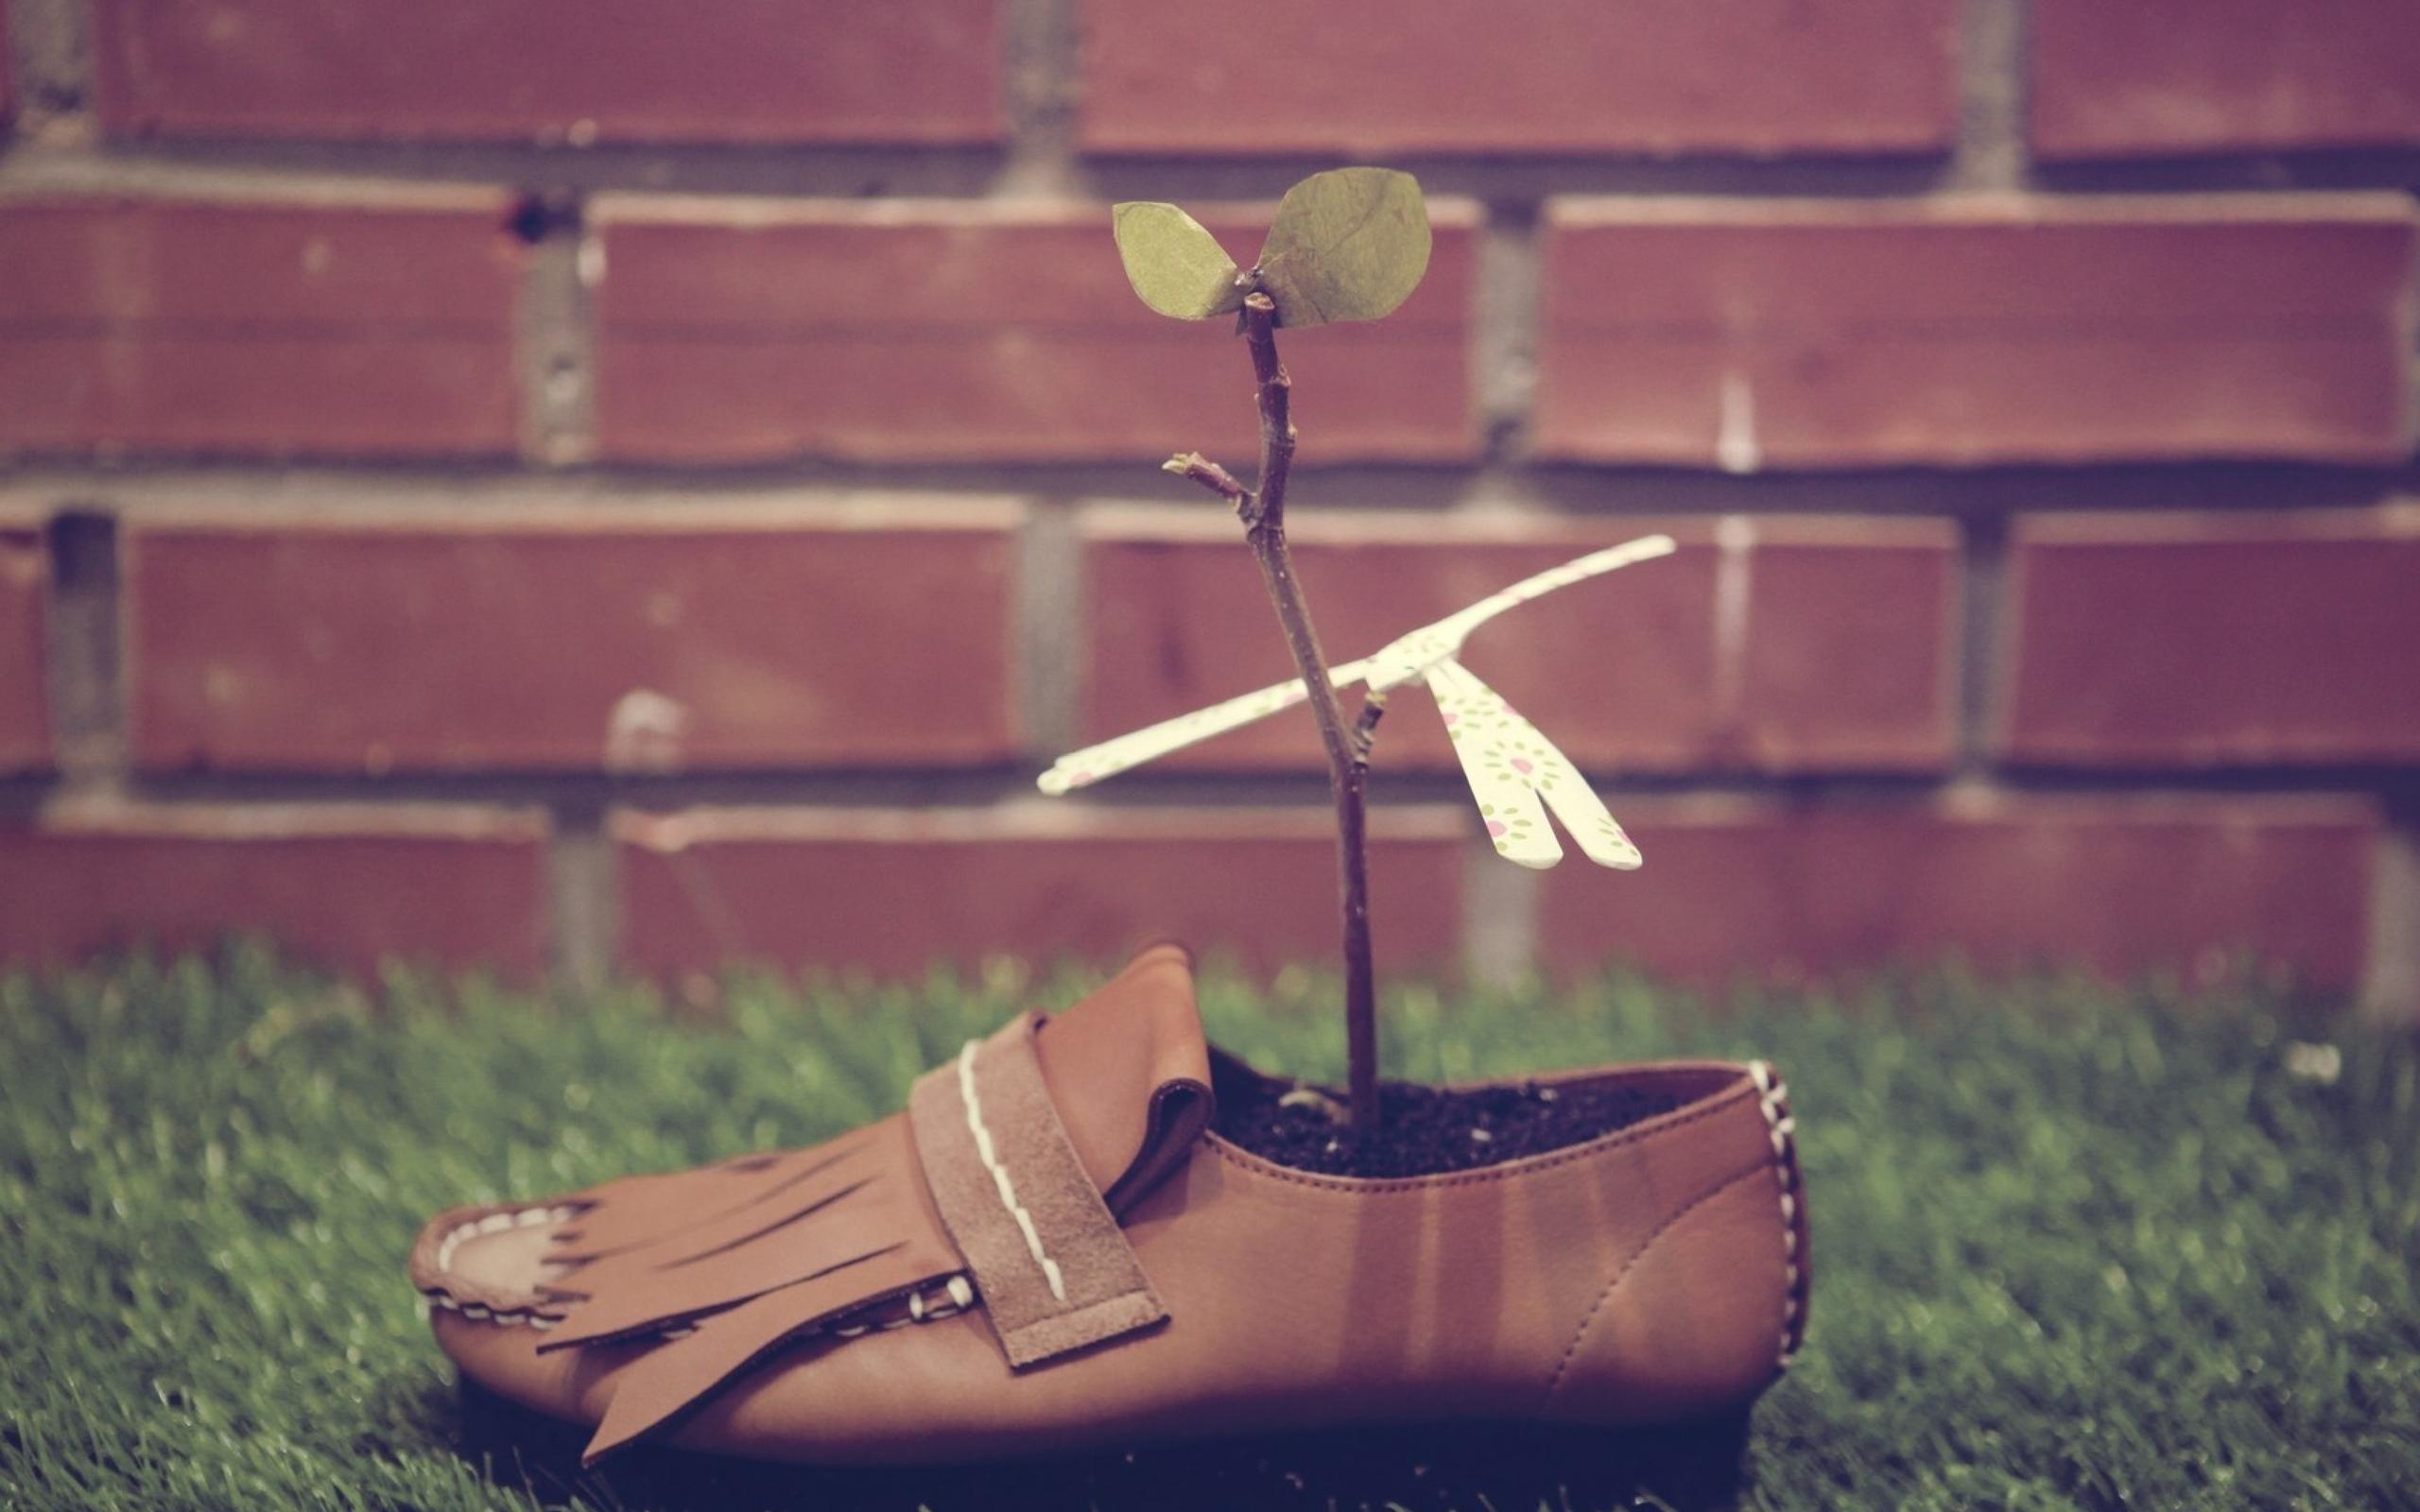 shoes-plants-grasses.jpg